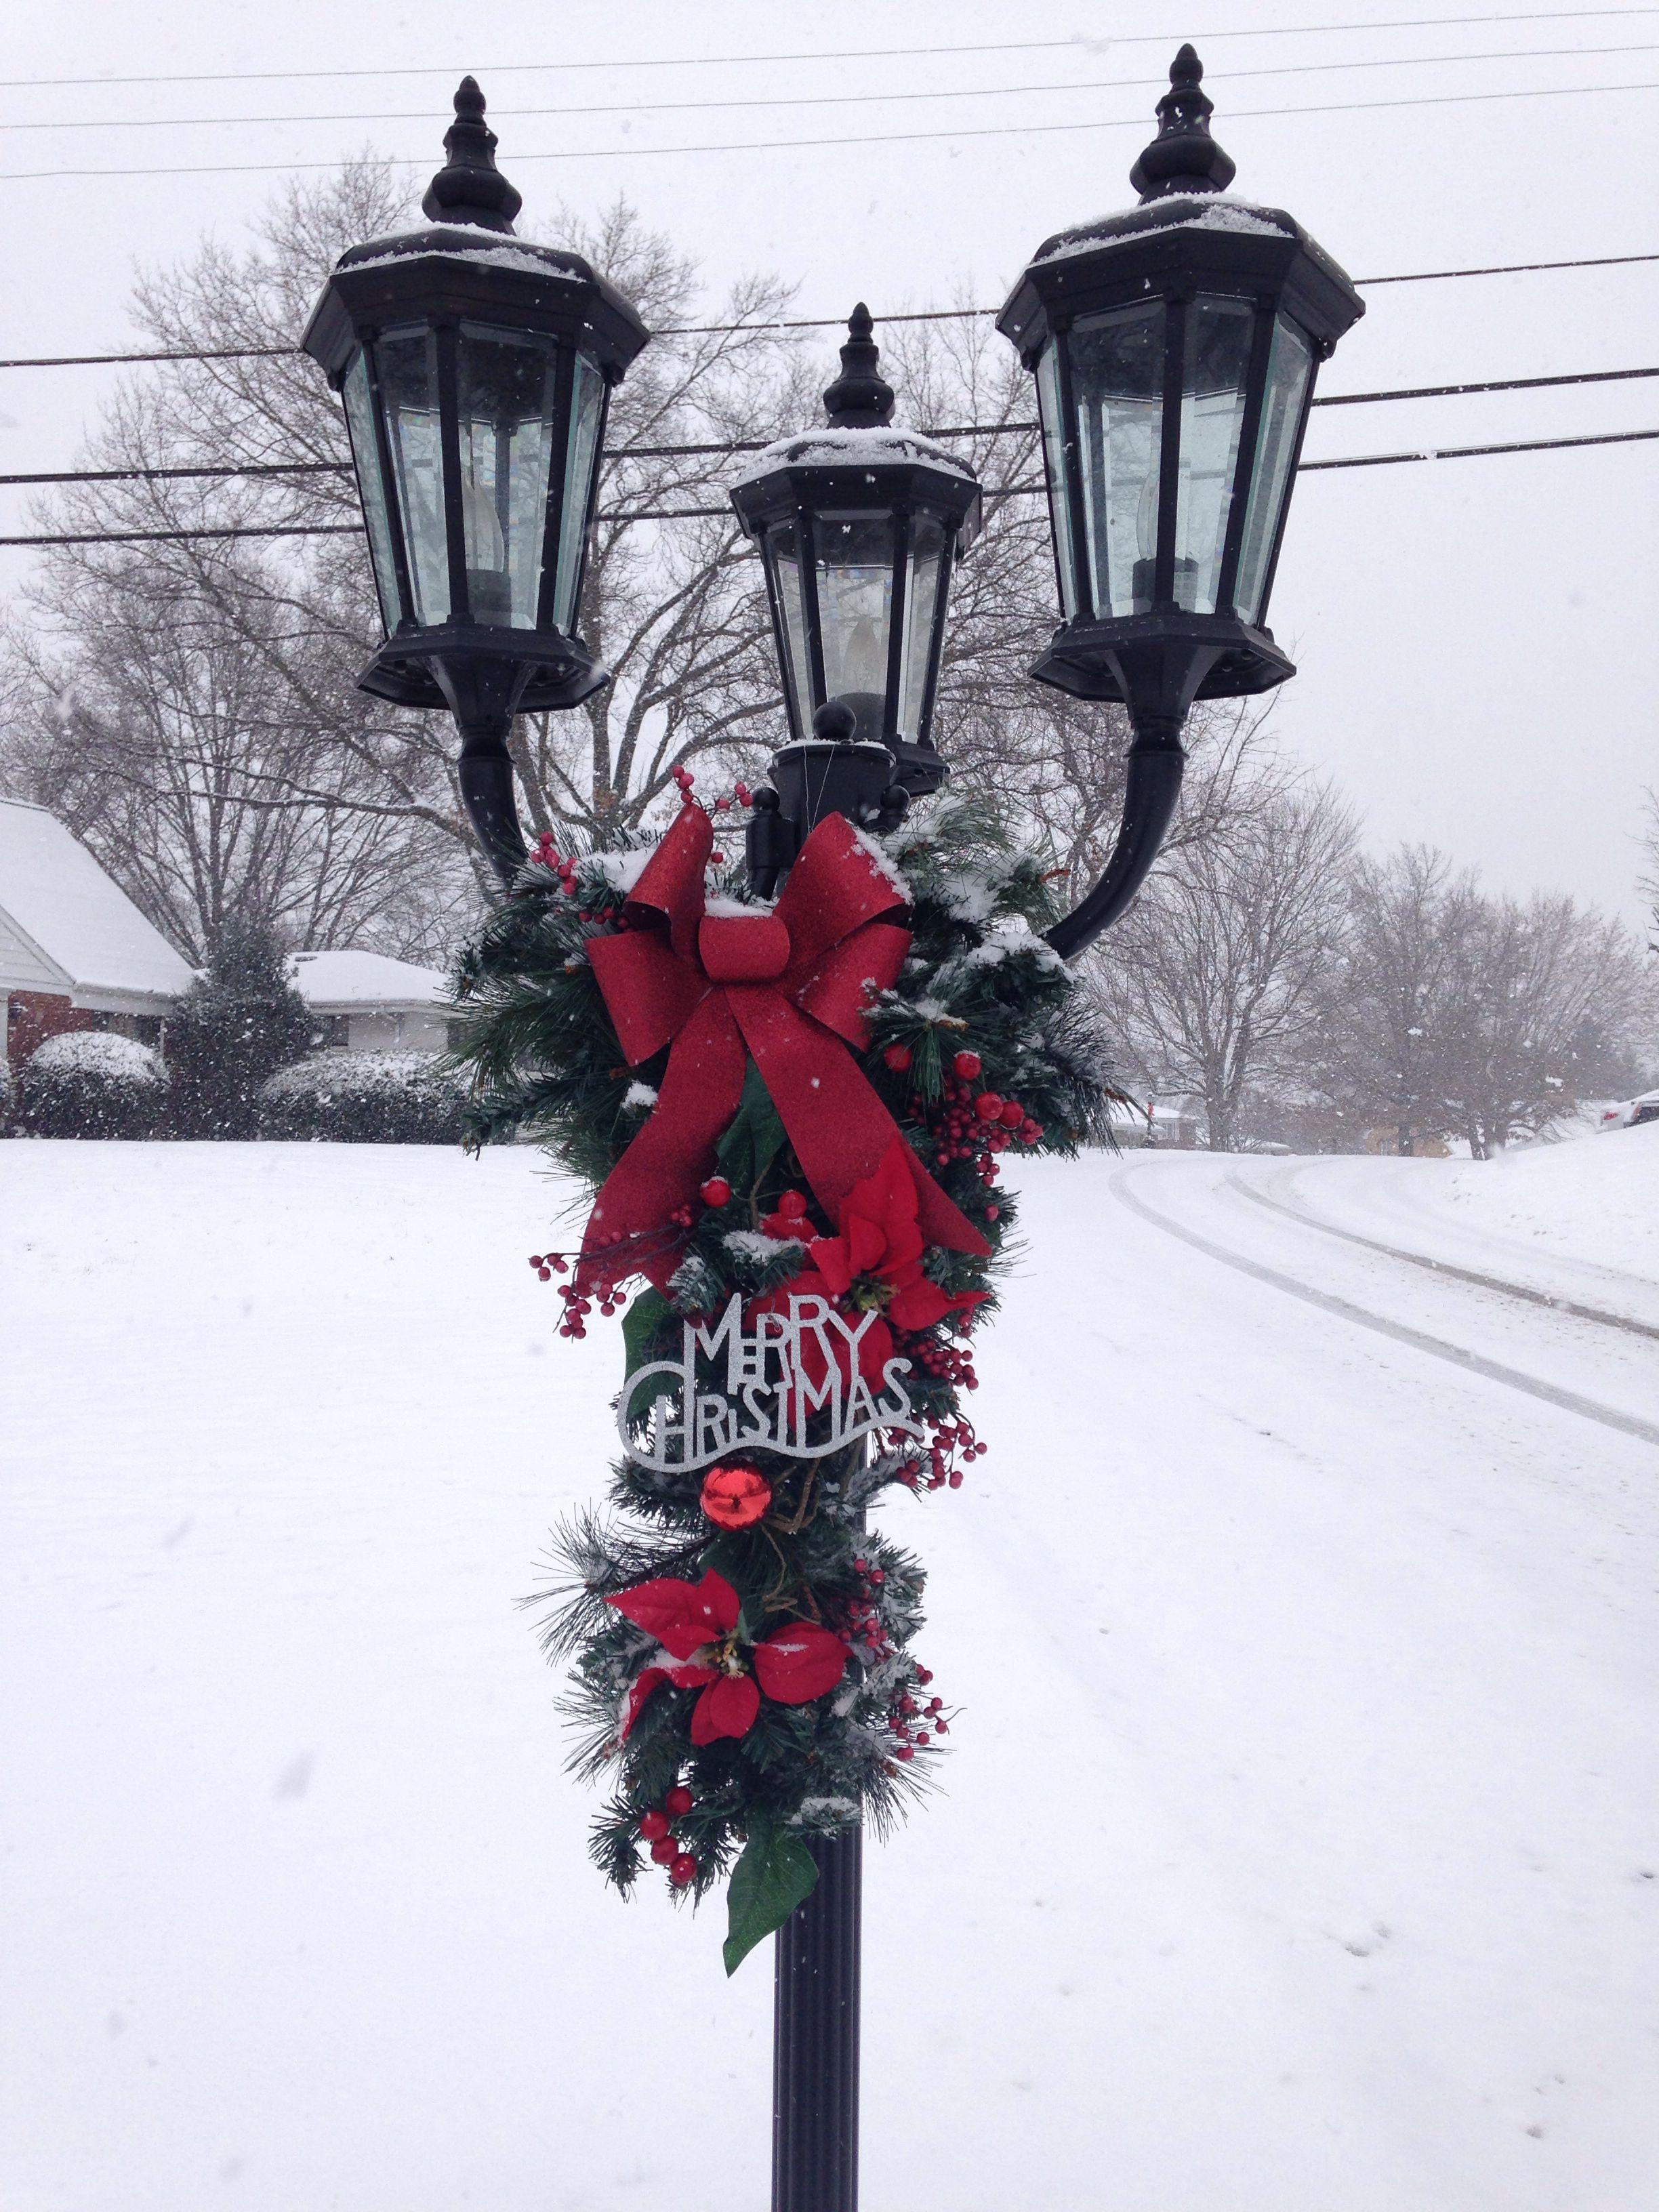 Christmas lamp post | Christmas lamp post, Christmas ...